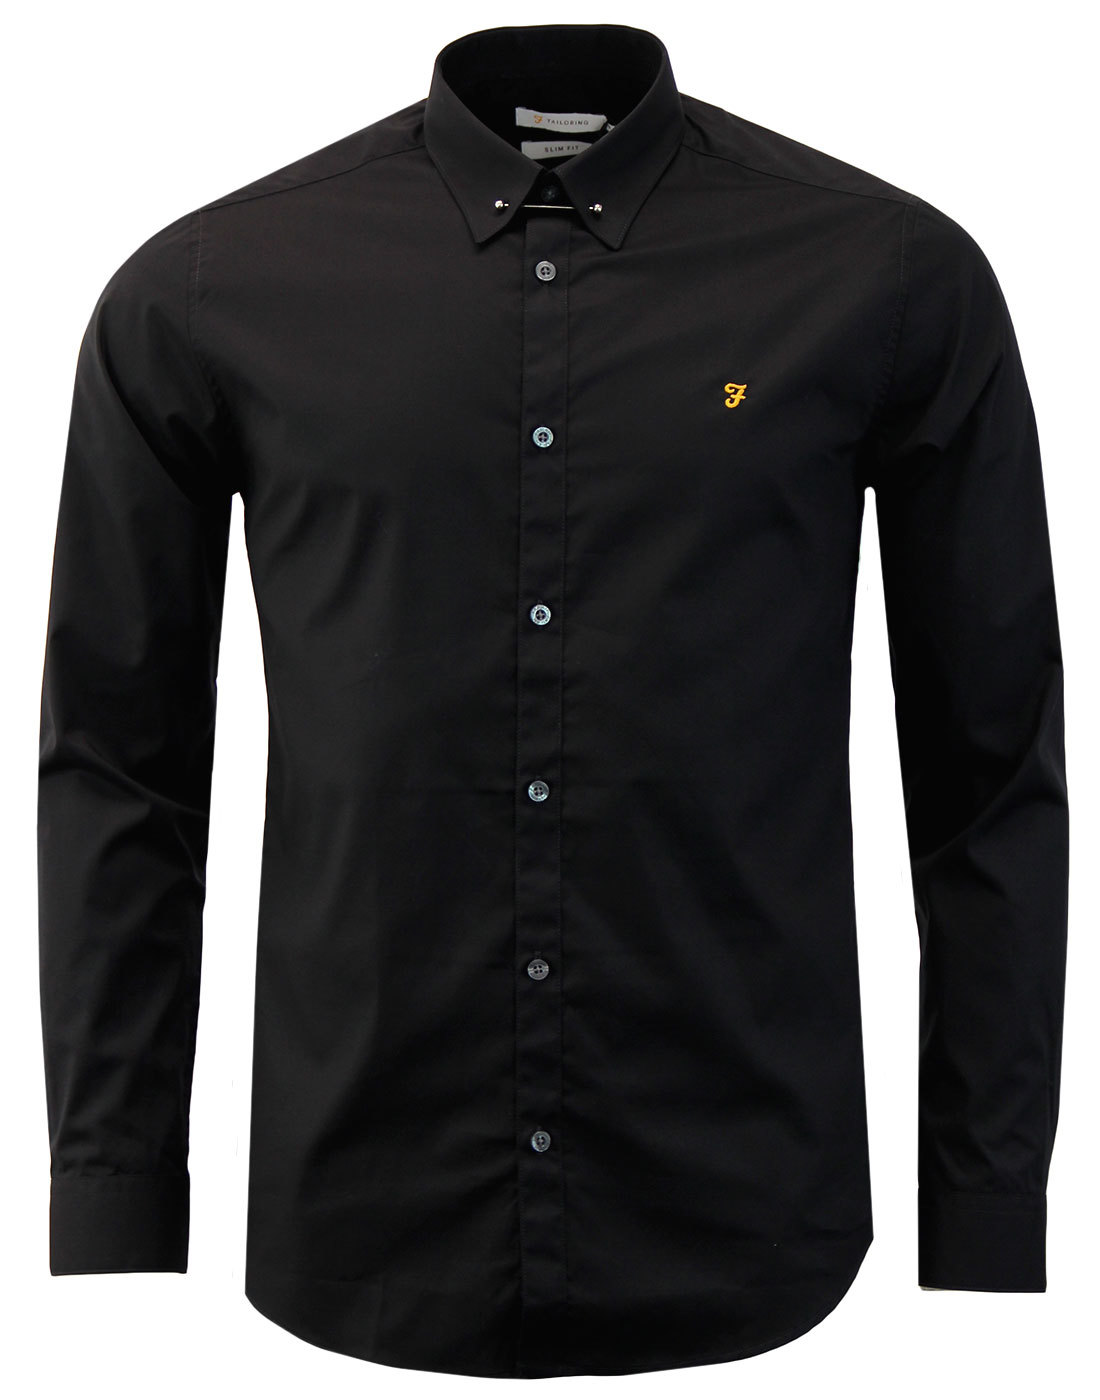 Handford FARAH Mens Mod Bar Collar Smart Shirt (B)